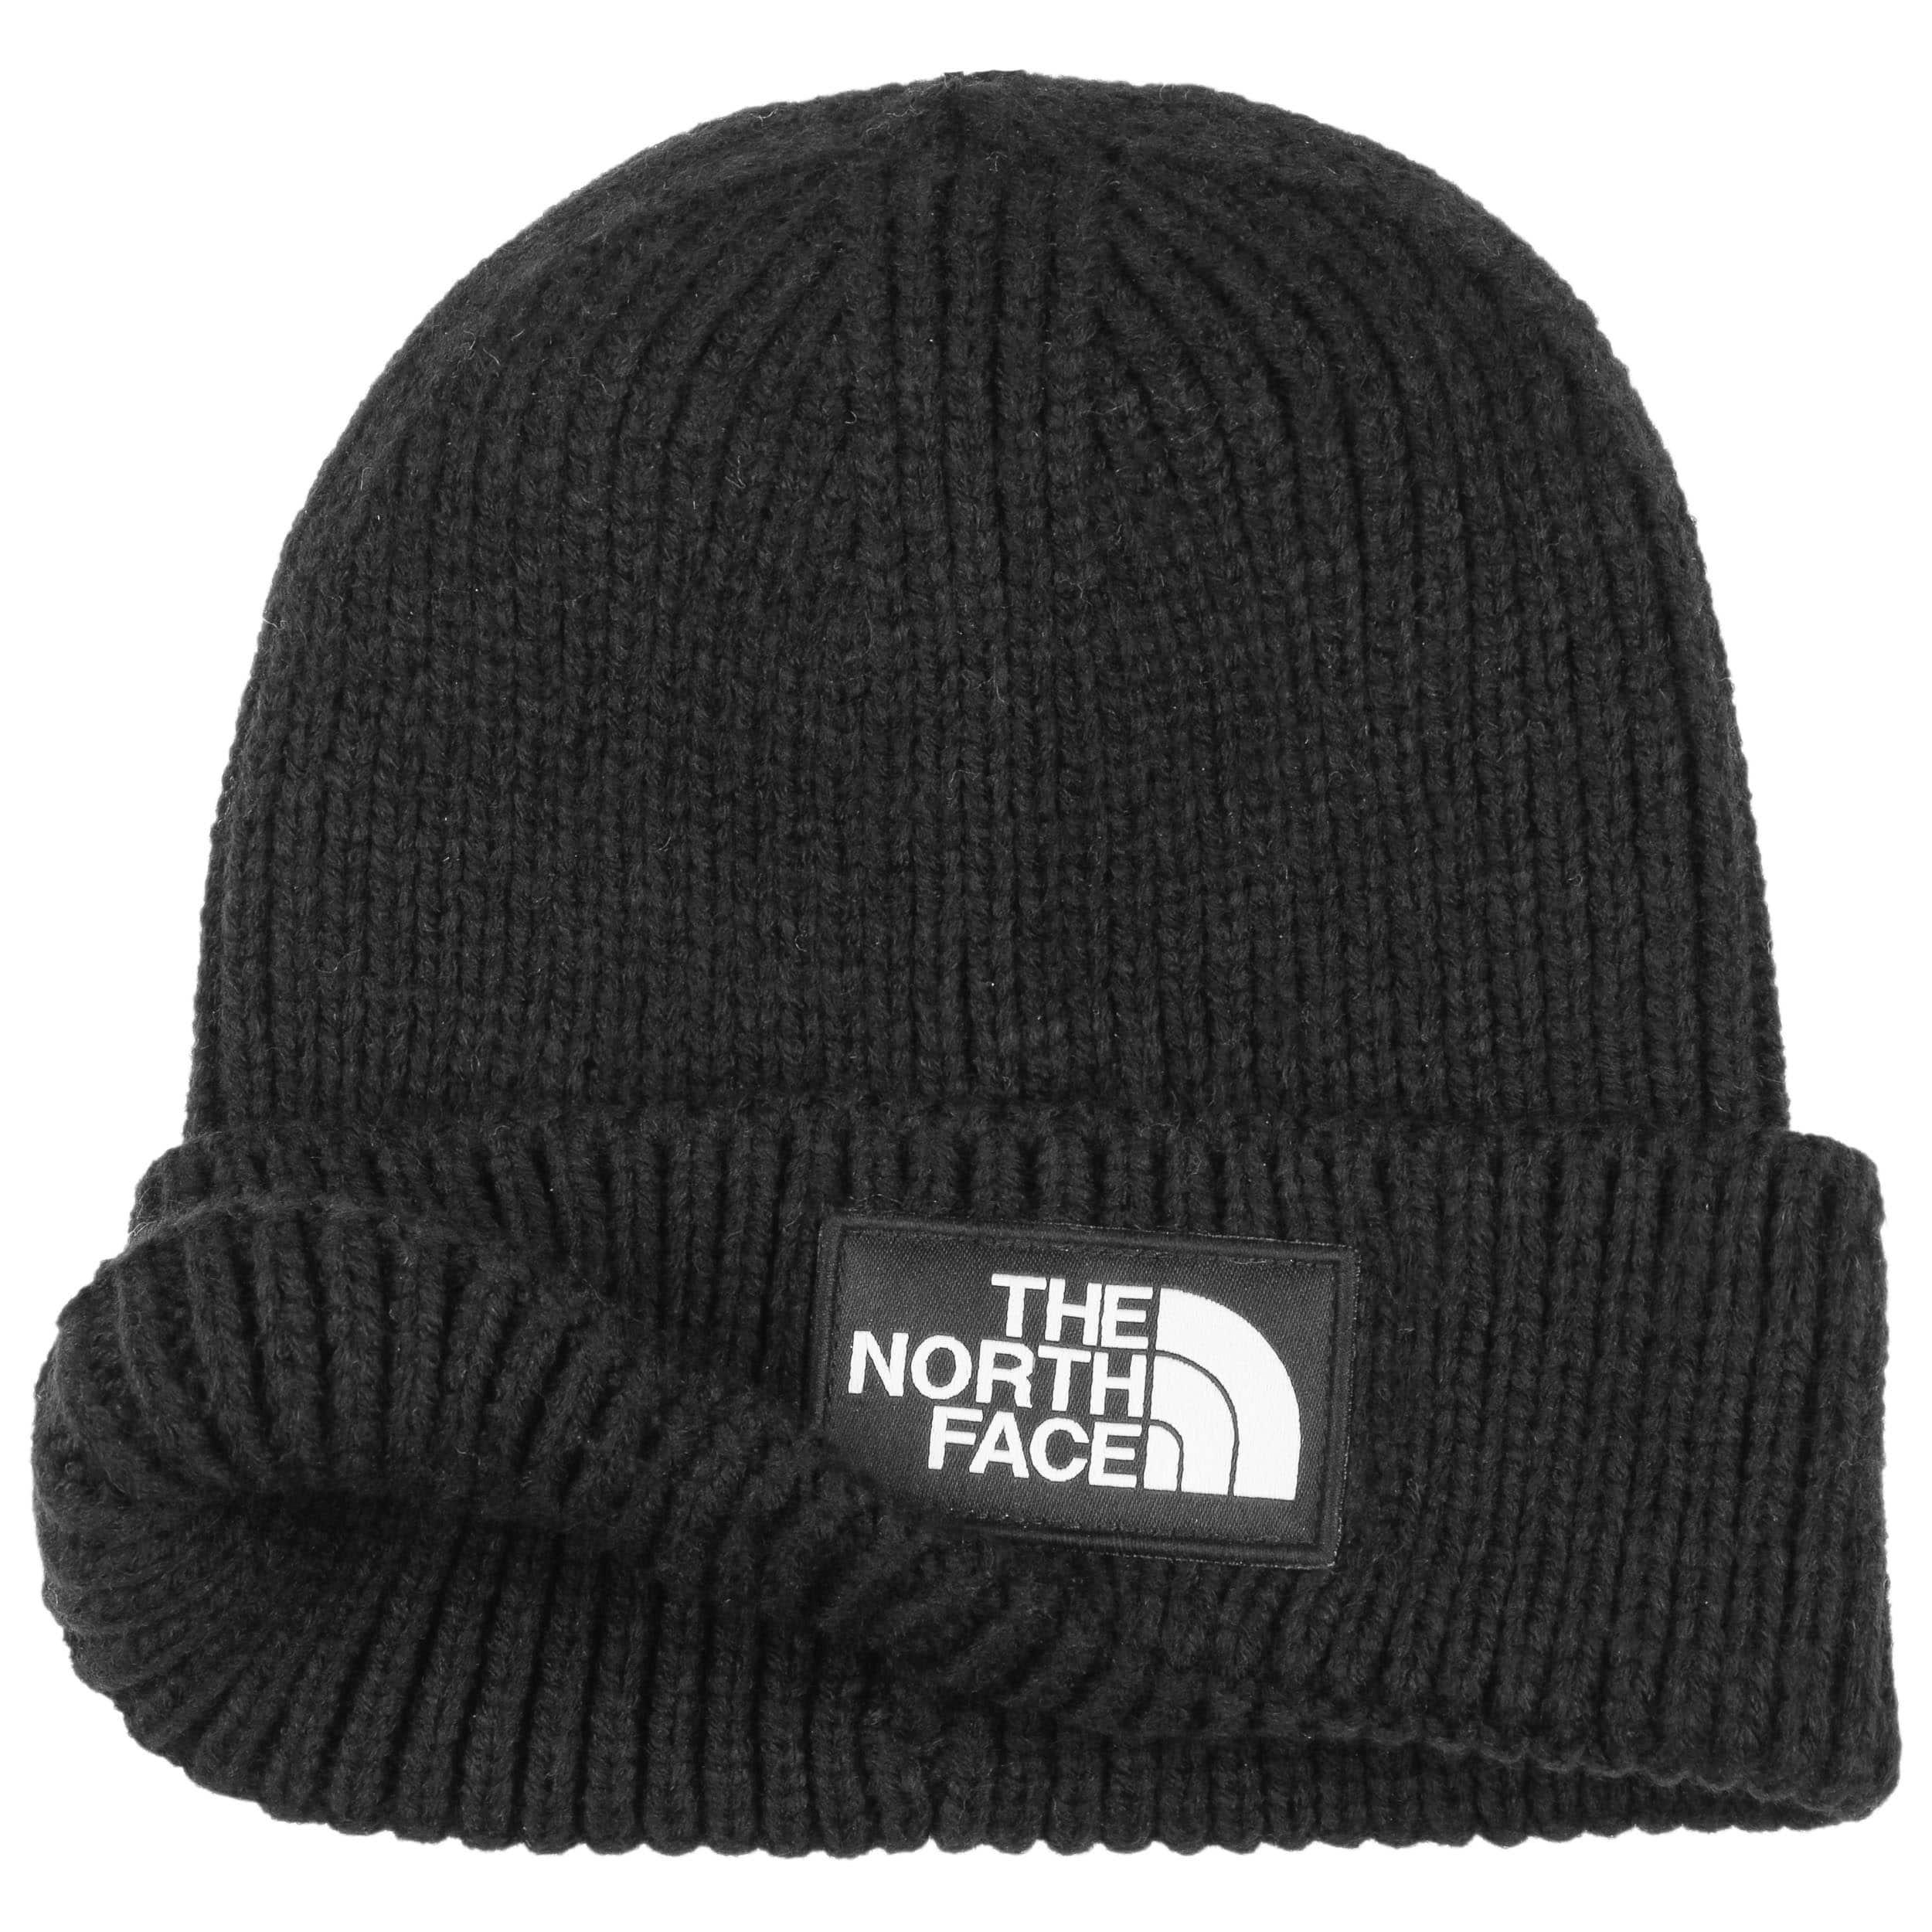 2bbc50808e537 ... Logo Box Beanie Hat by The North Face - black 1 ...